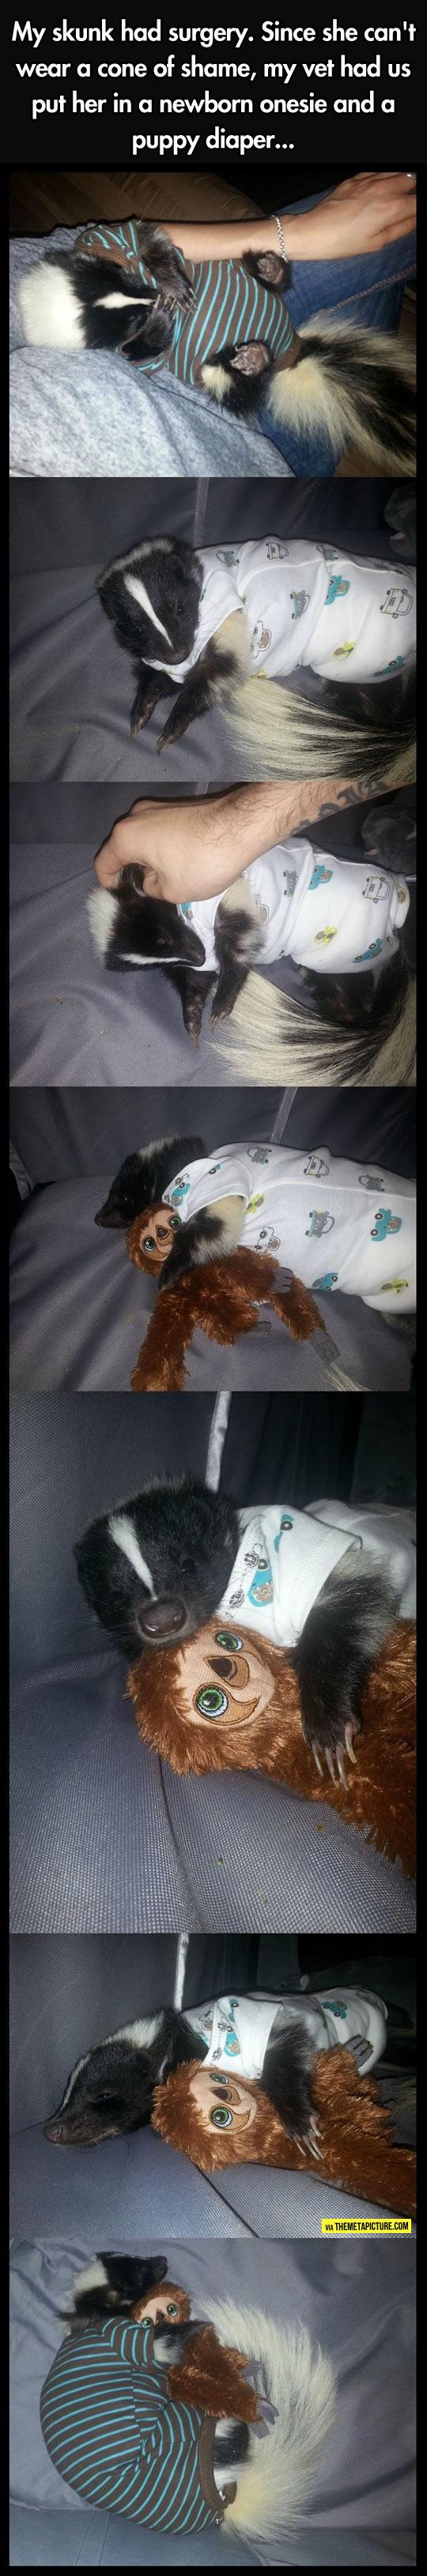 cool-skunk-baby-diaper-surgery